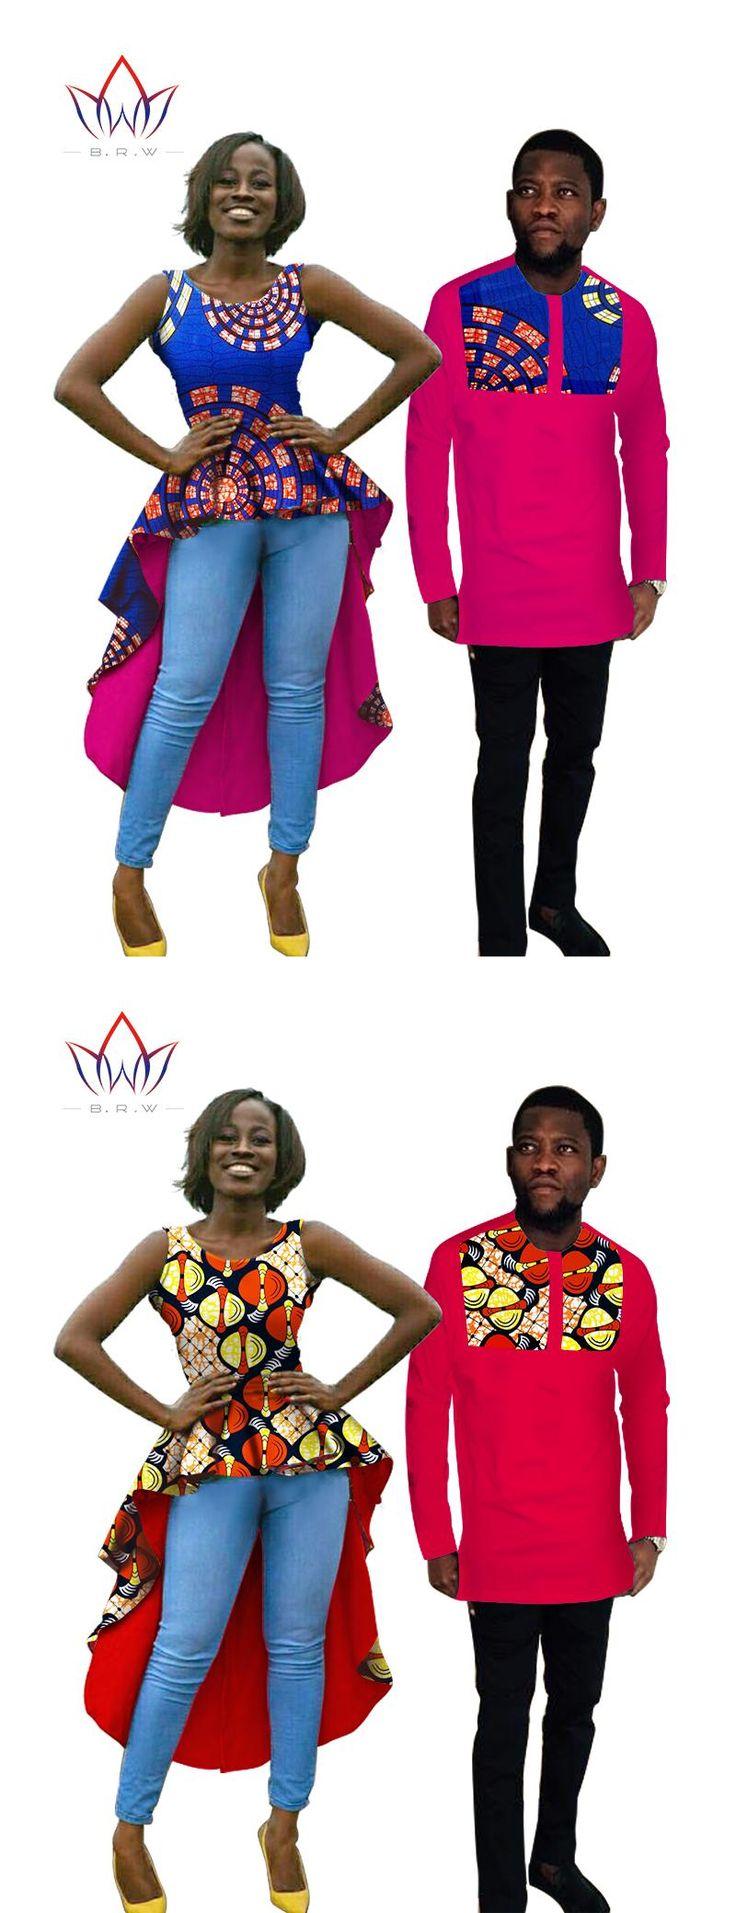 Hot Sale Couple Clothes Women Men Dress  traditional african clothing Dress Shirt afrikaanse kleding voor vrouwen bazin BRWYQ03